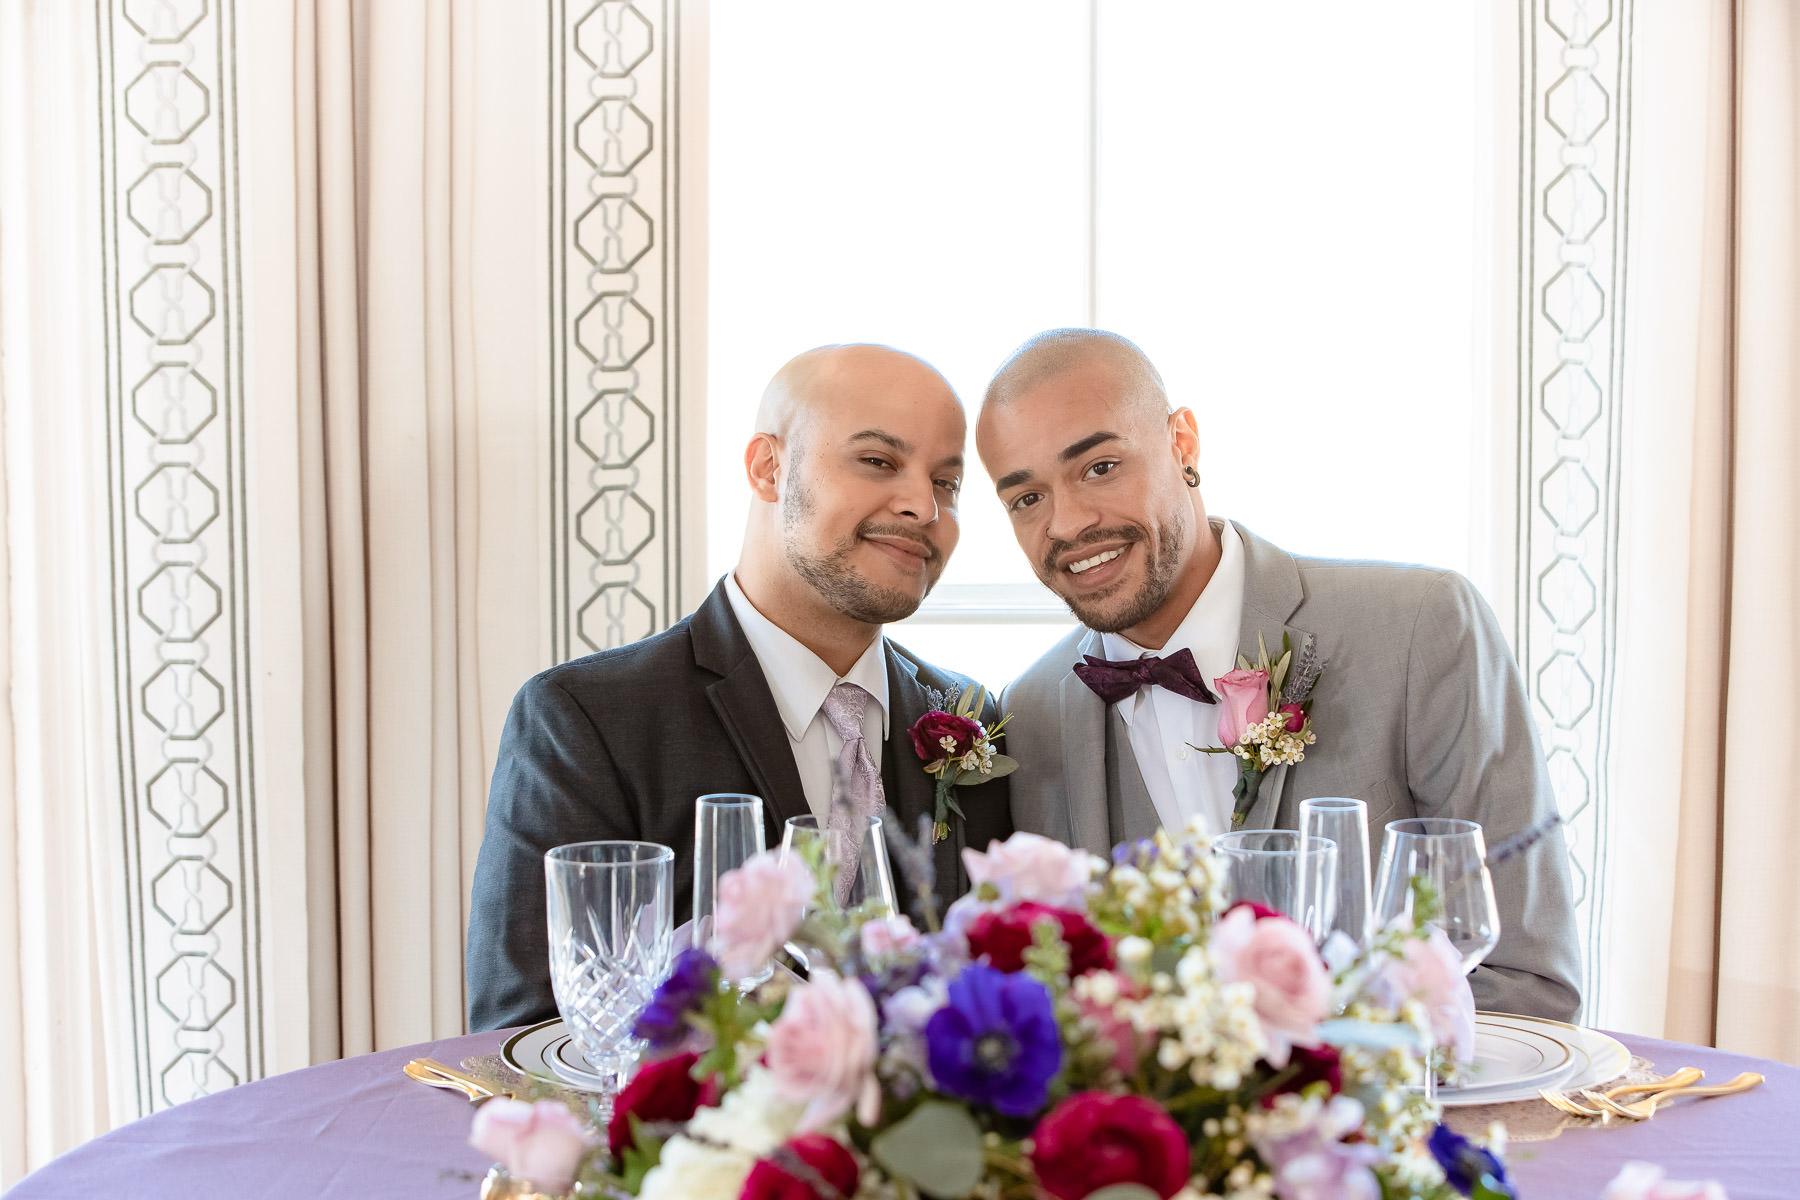 Eisenhower House, Newport, Rhode Island, Tracy Jenkins Photography, wedding, LGBTQ+, LGBT, Gay, Inclusive, Photography, Wedding photography, grooms, groom, sweetheart table